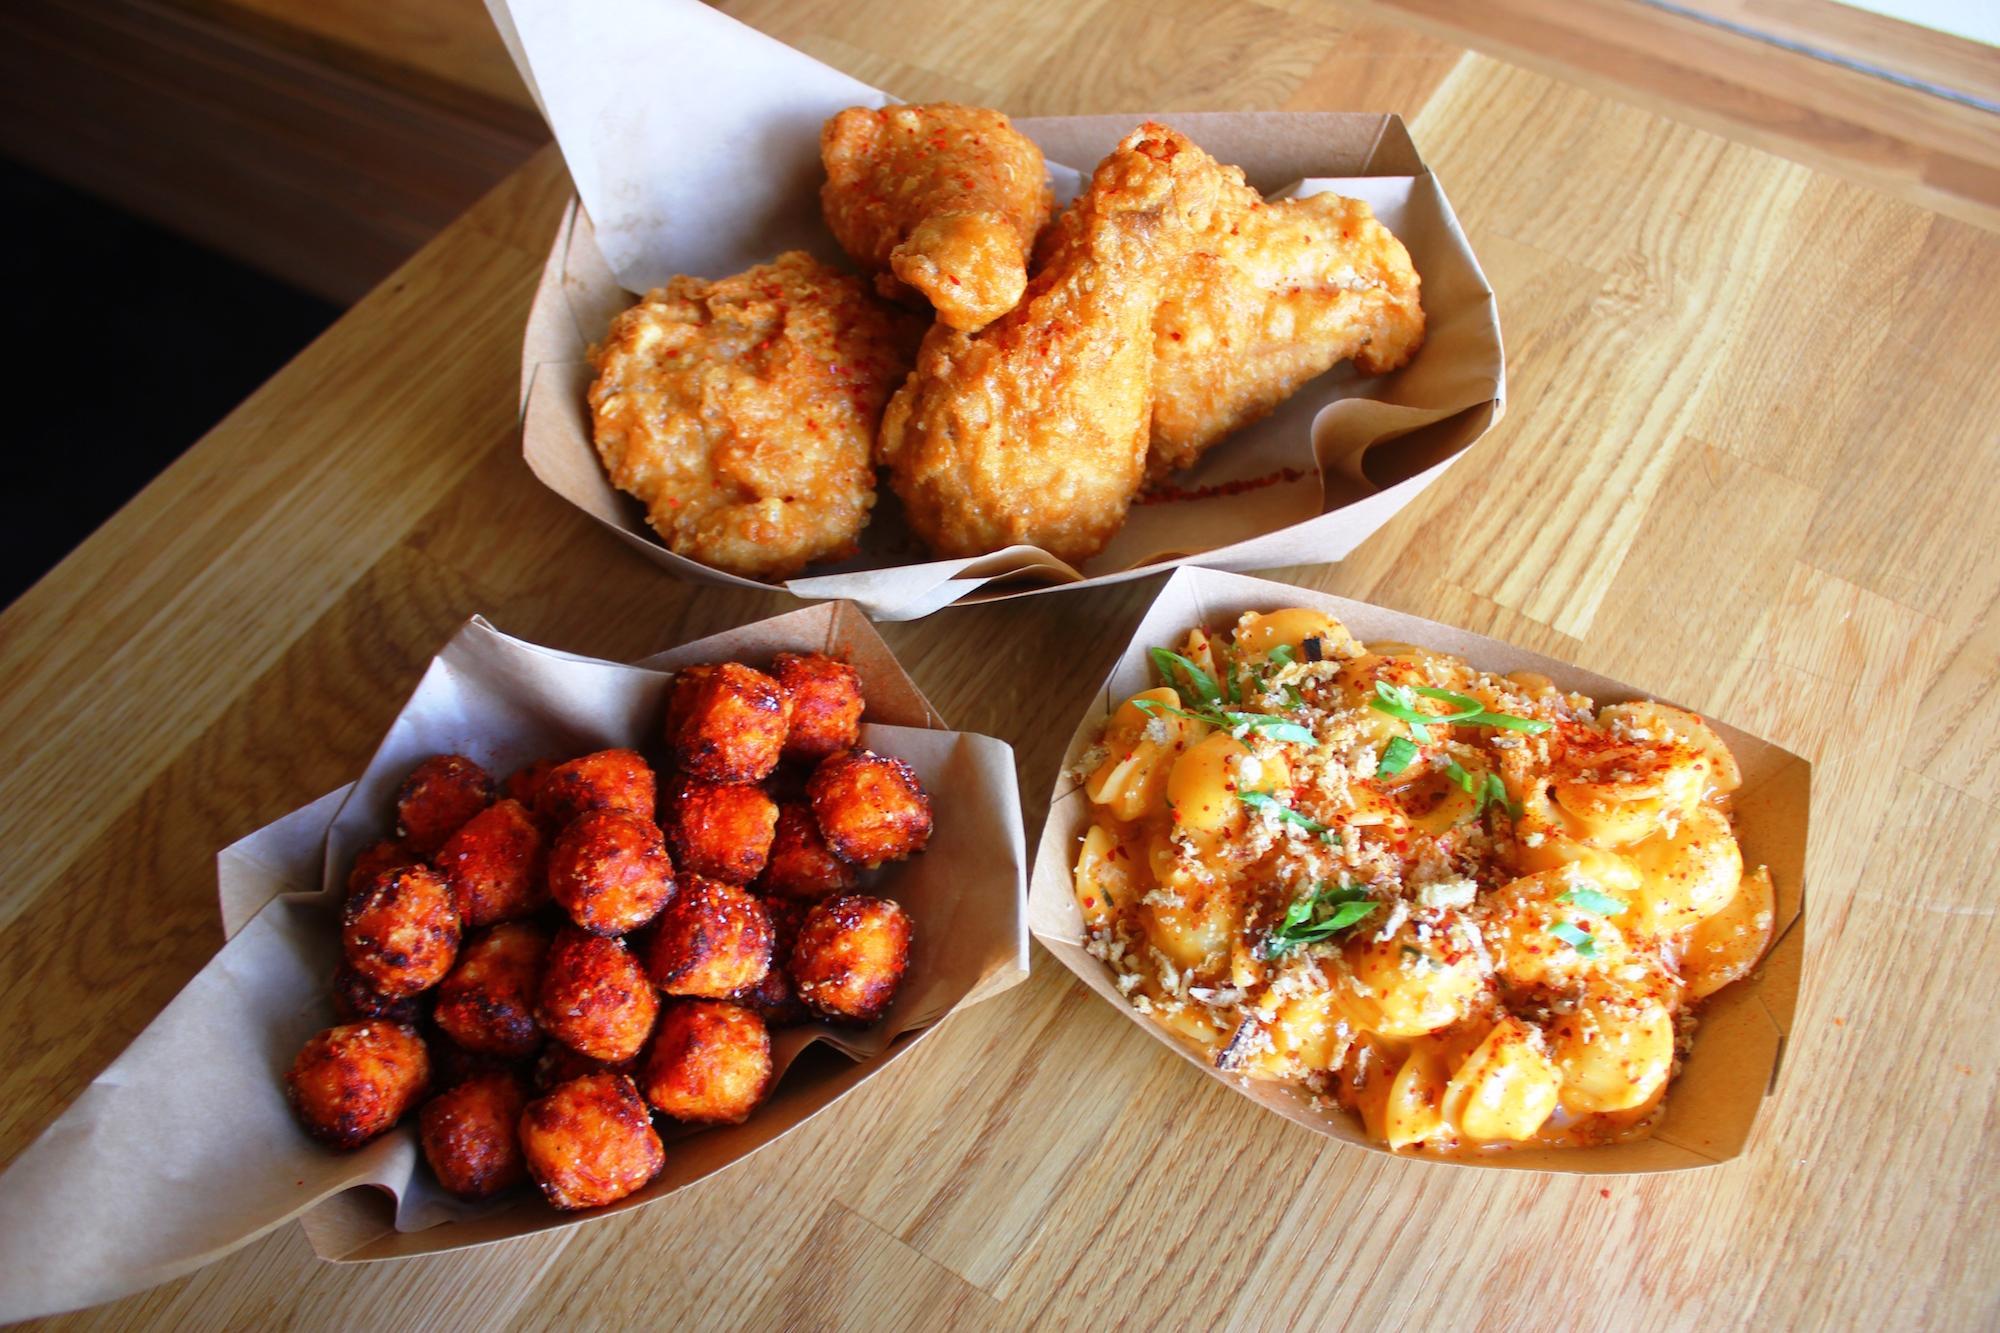 Ezell fried chicken recipe